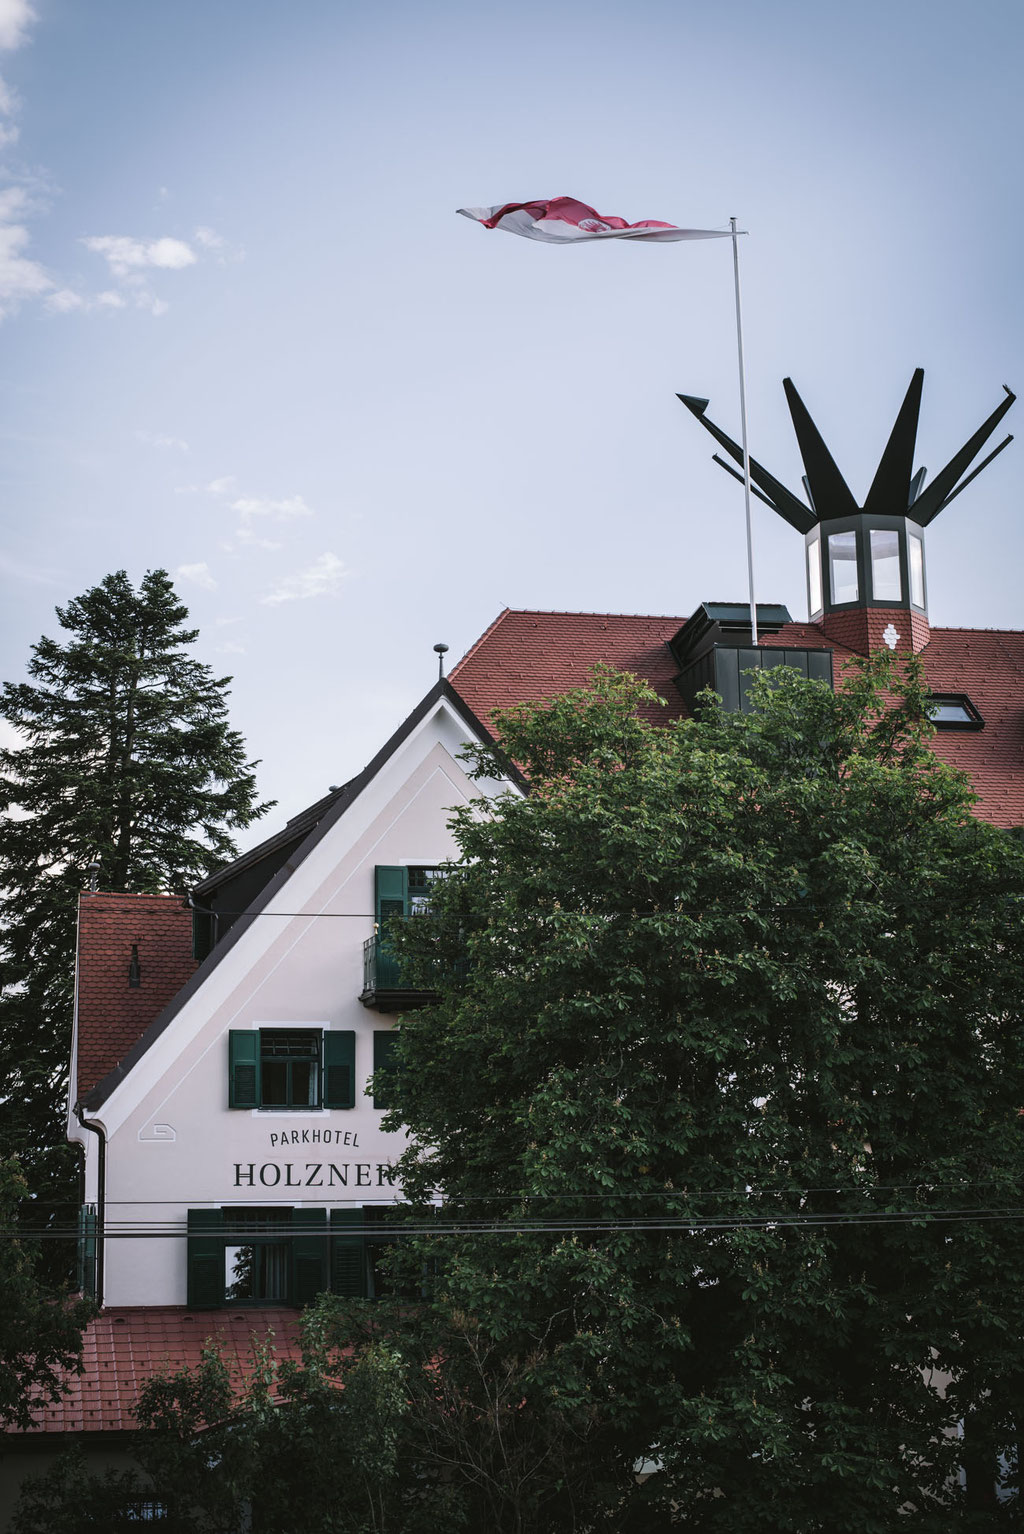 Parkhotel Holzner - Ritten/Südtirol (Familienhotel, Wellnesshotel, Wanderhotel, Aktivhotel, Naturhotel, Gourmetrestaurant)